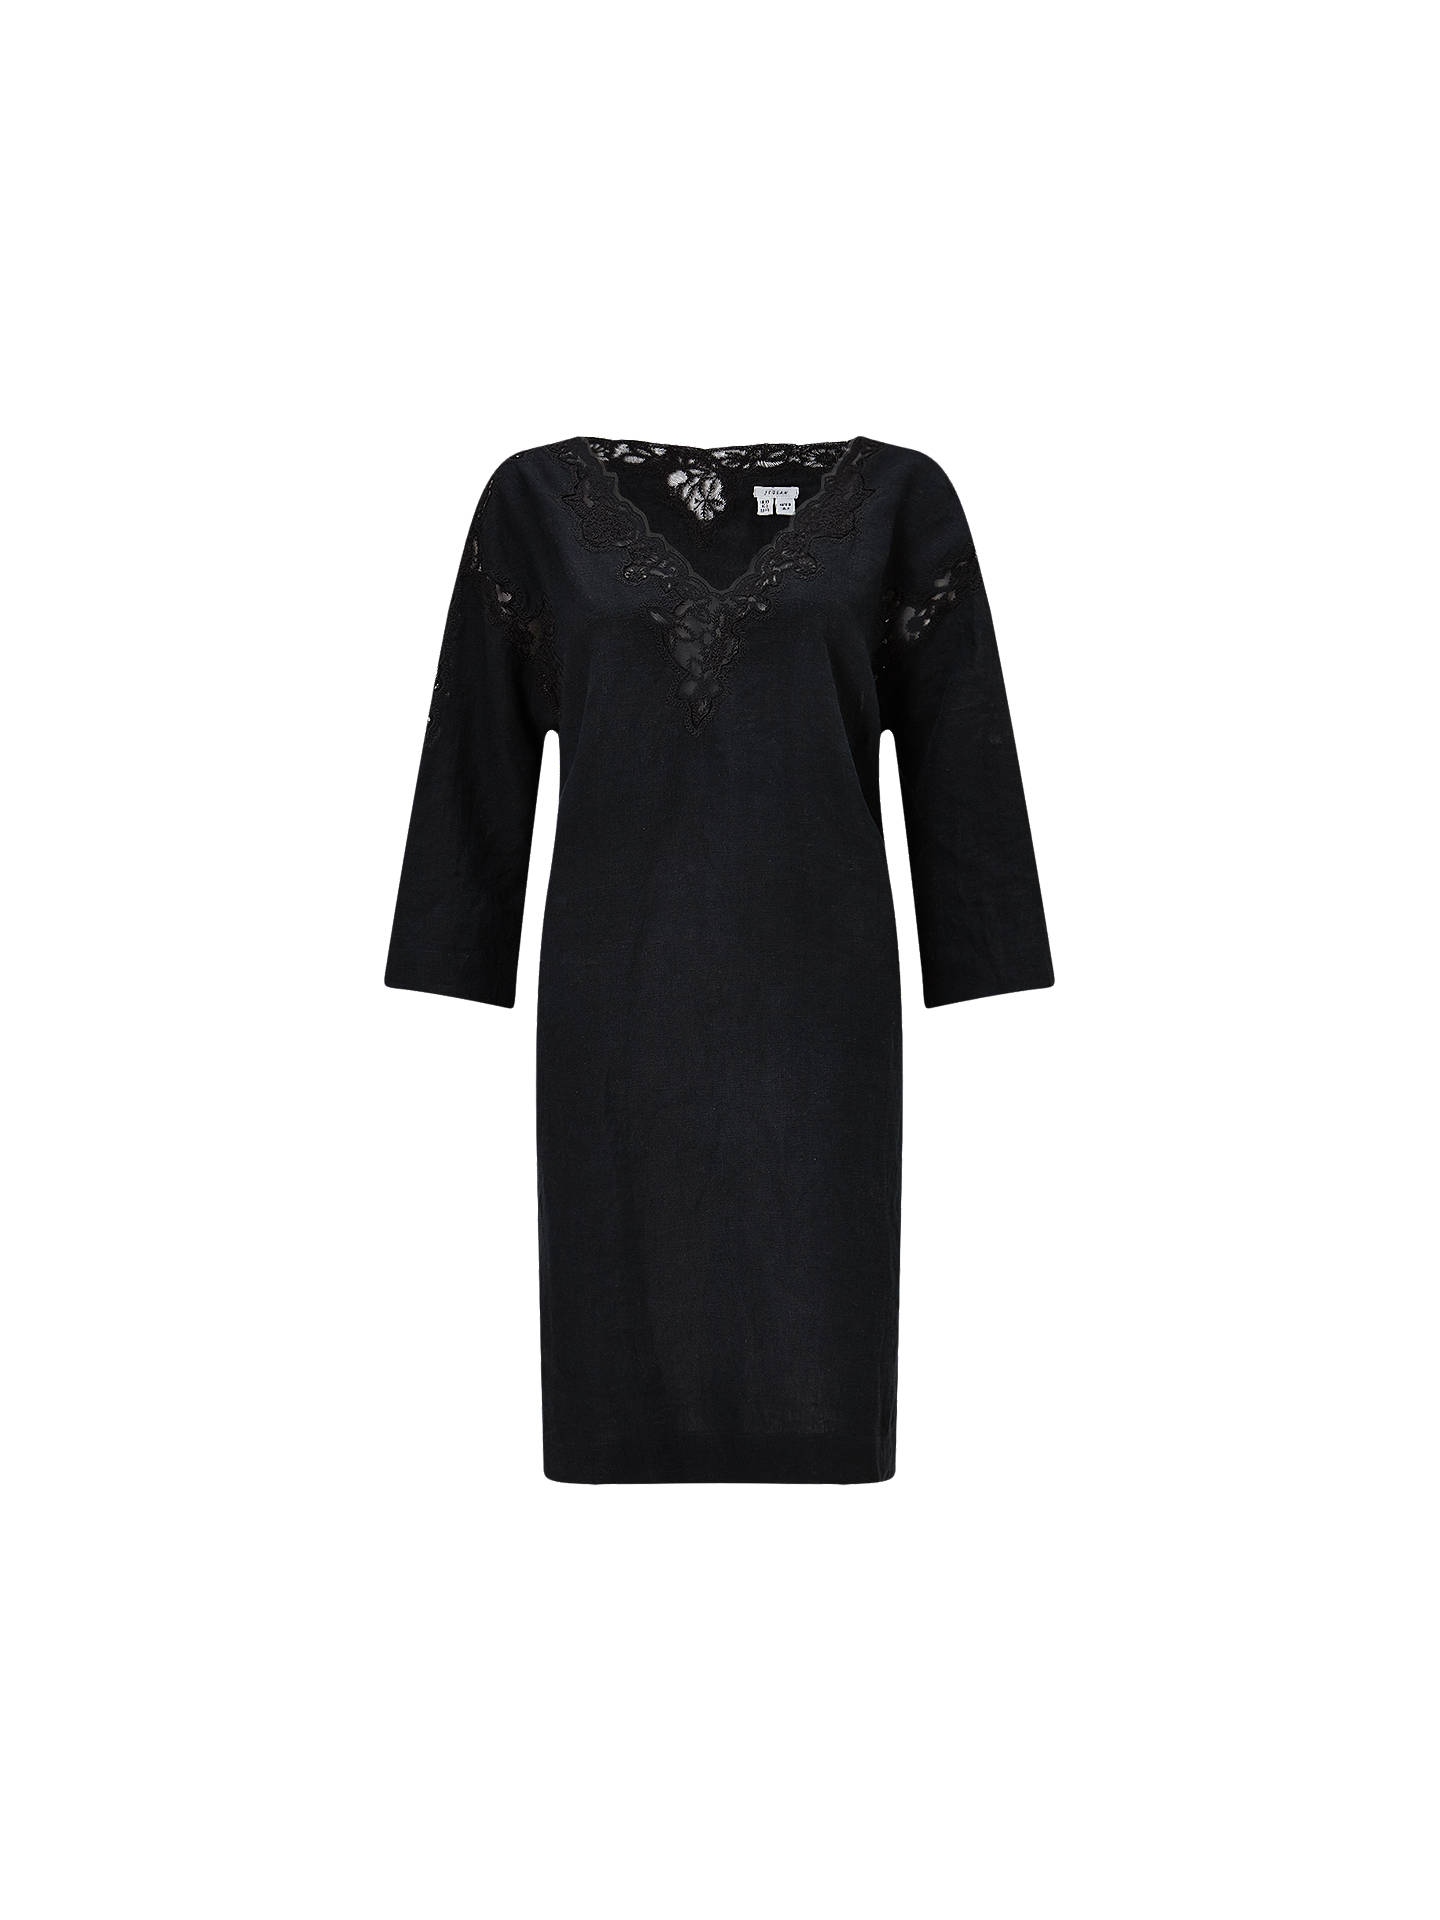 Jigsaw Floral Embroidered Linen Dress Womens New Black